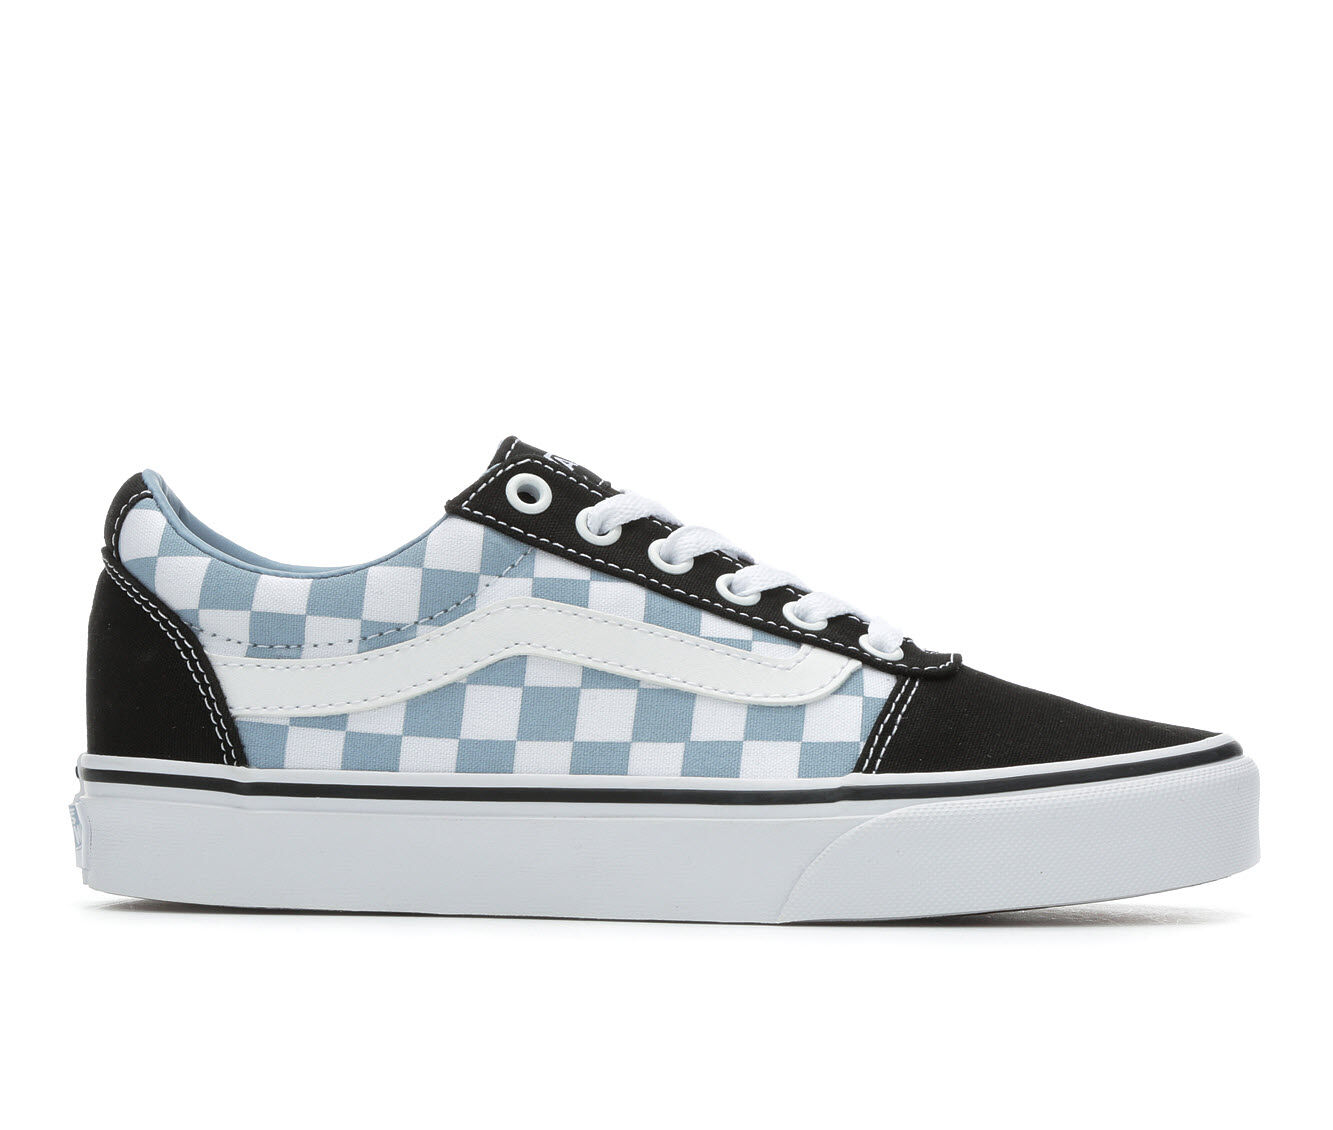 Women's Vans Ward Skate Shoes Blk/Blue Fog